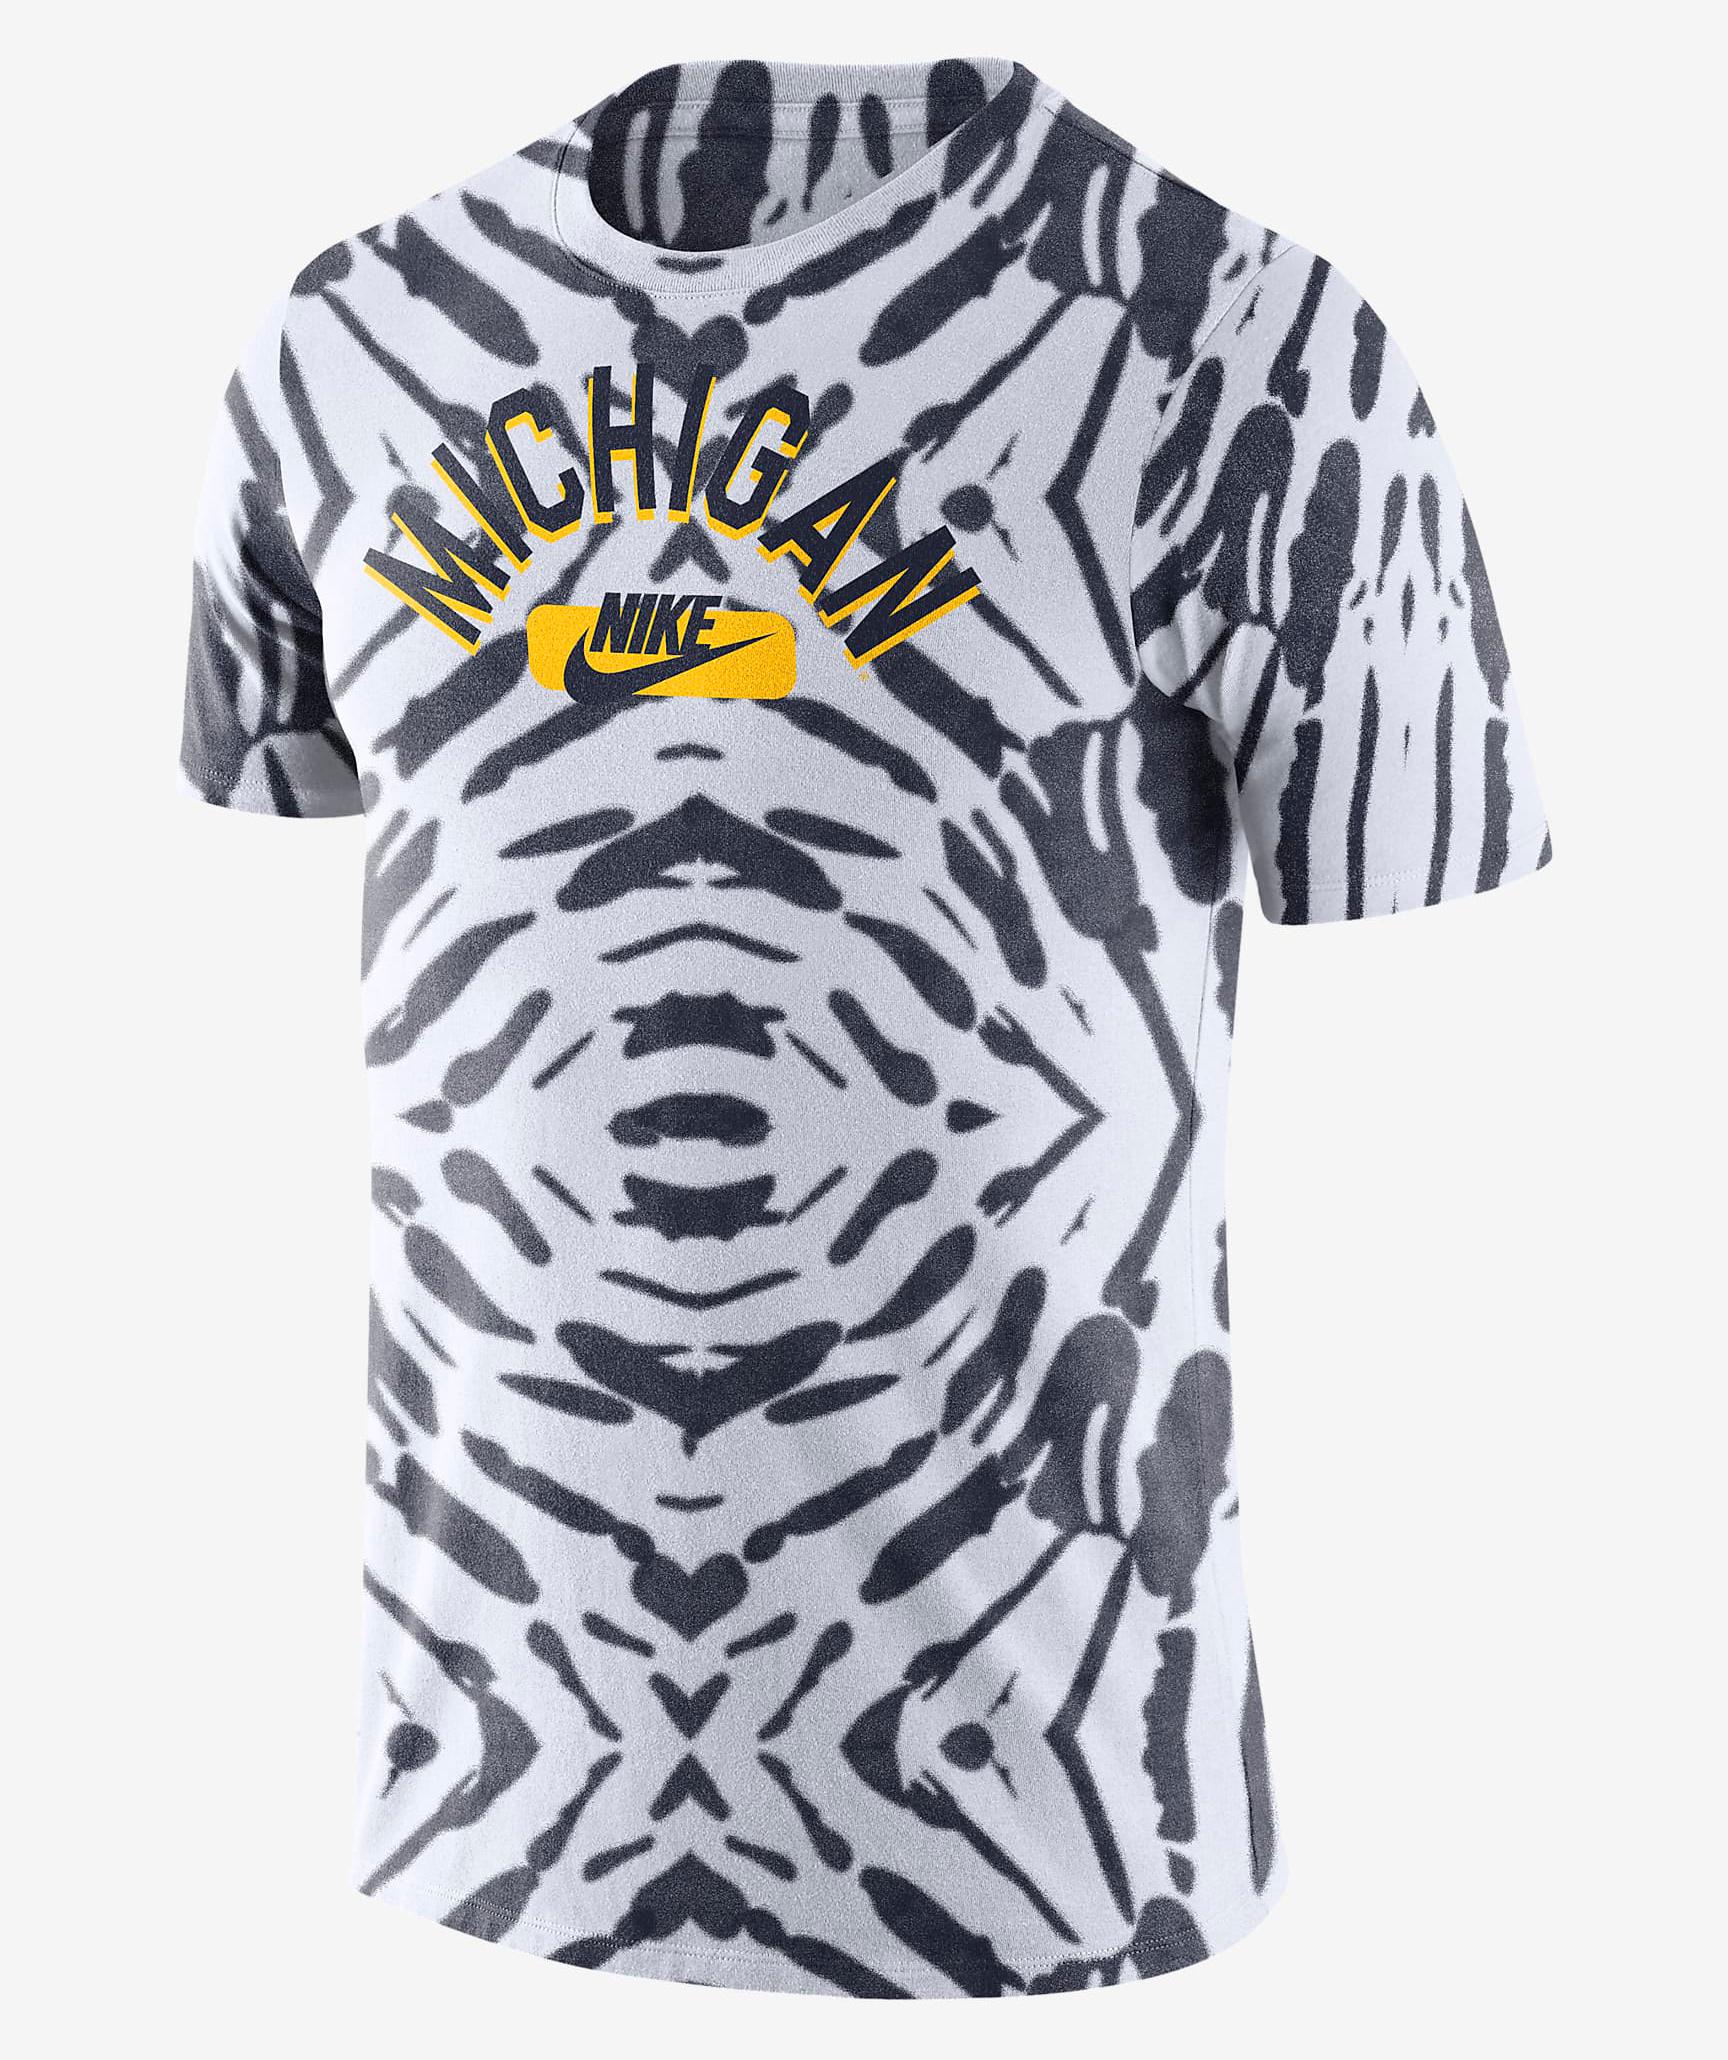 nike-michigan-wolverines-printed-shirt